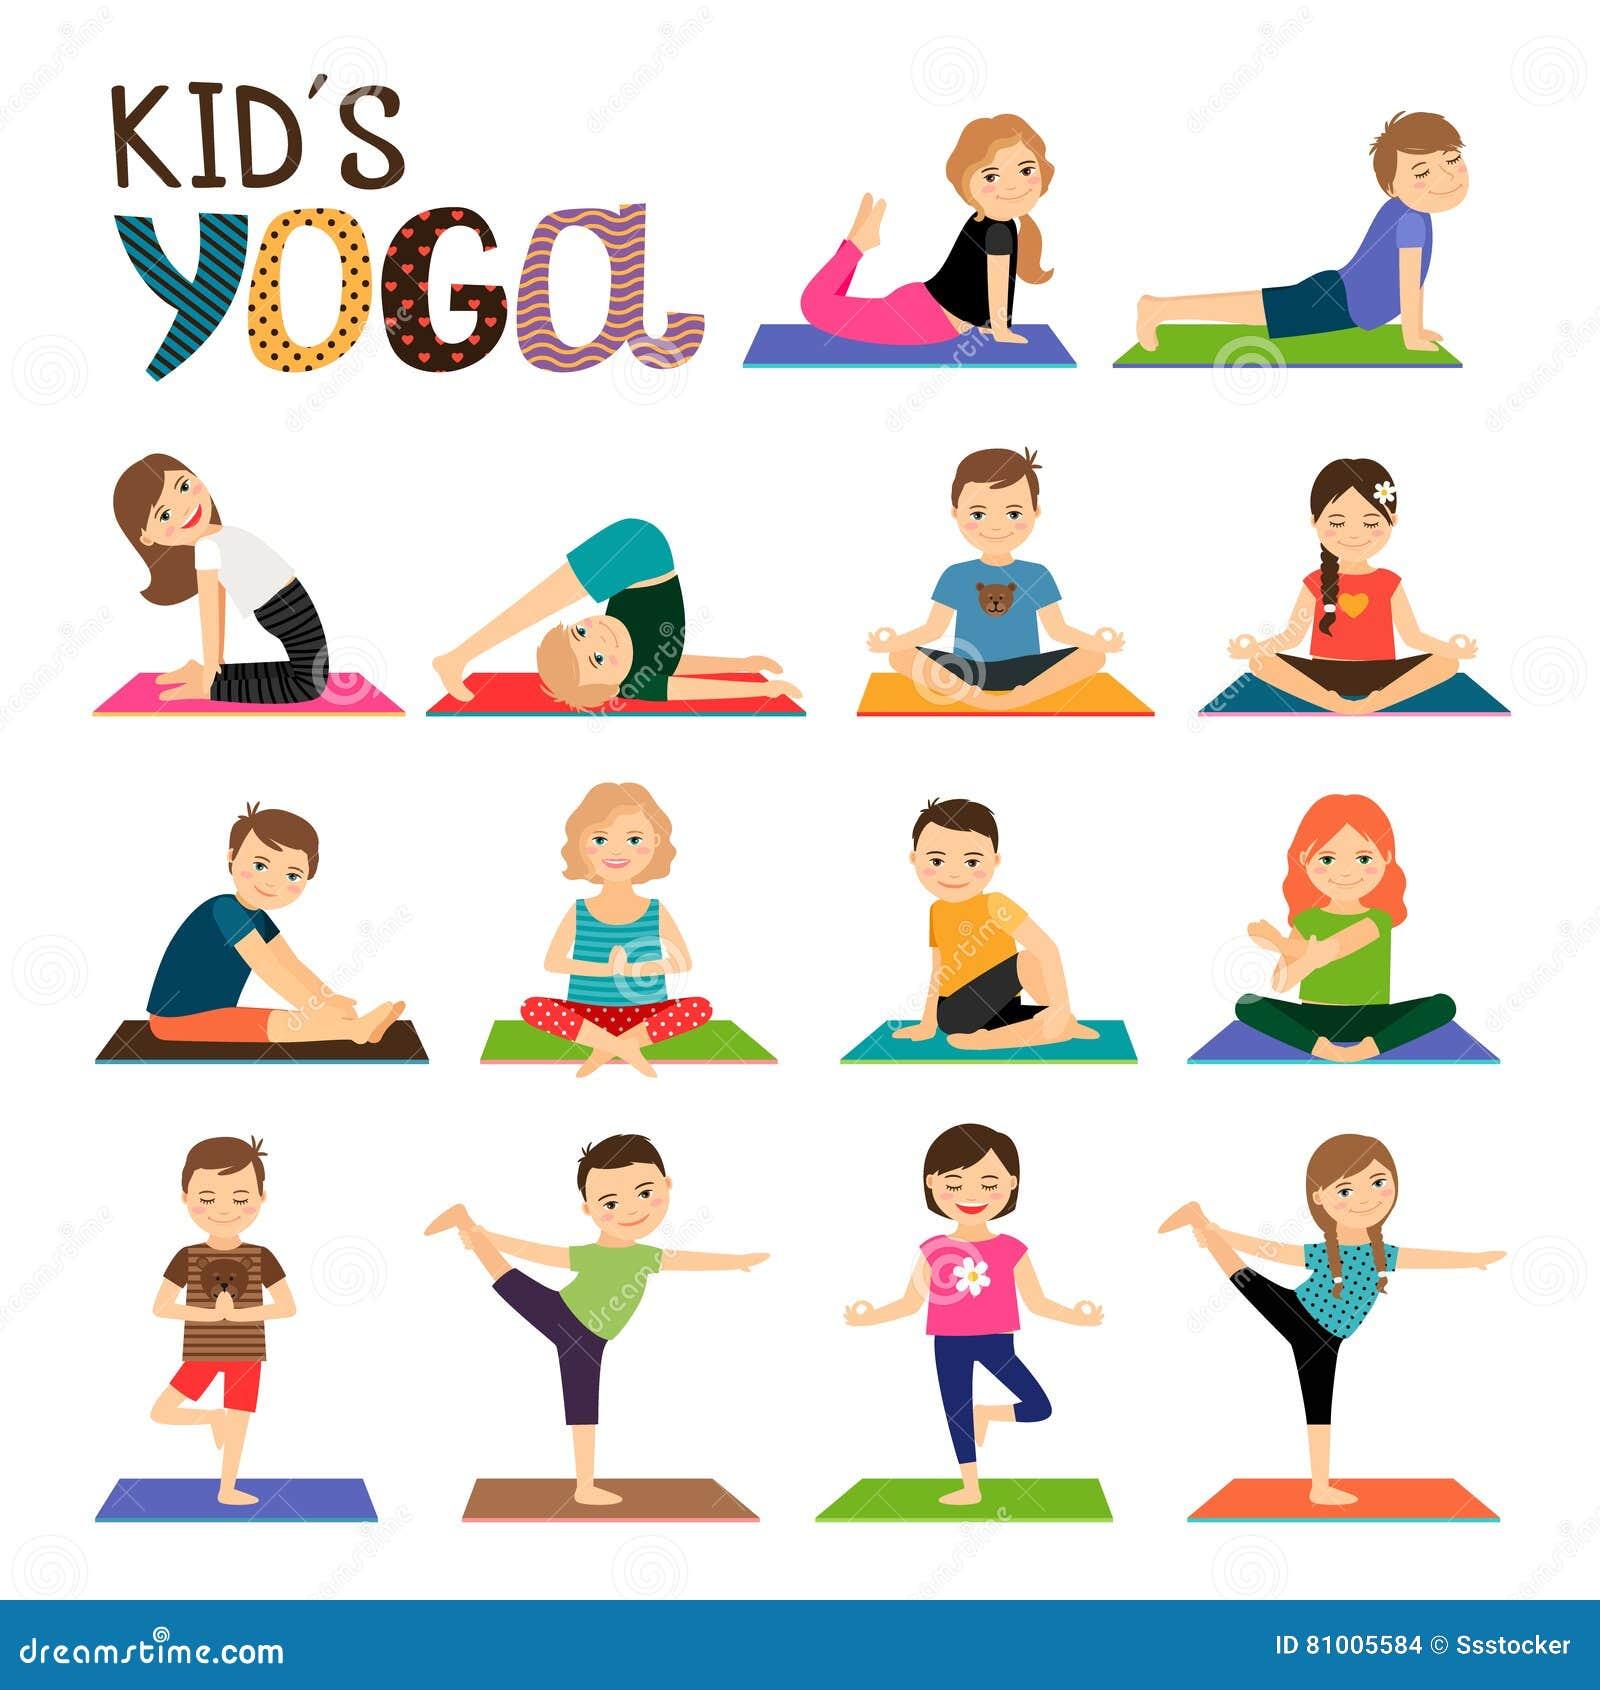 Yoga Poses For Kids Clip Art   www.pixshark.com - Images ...